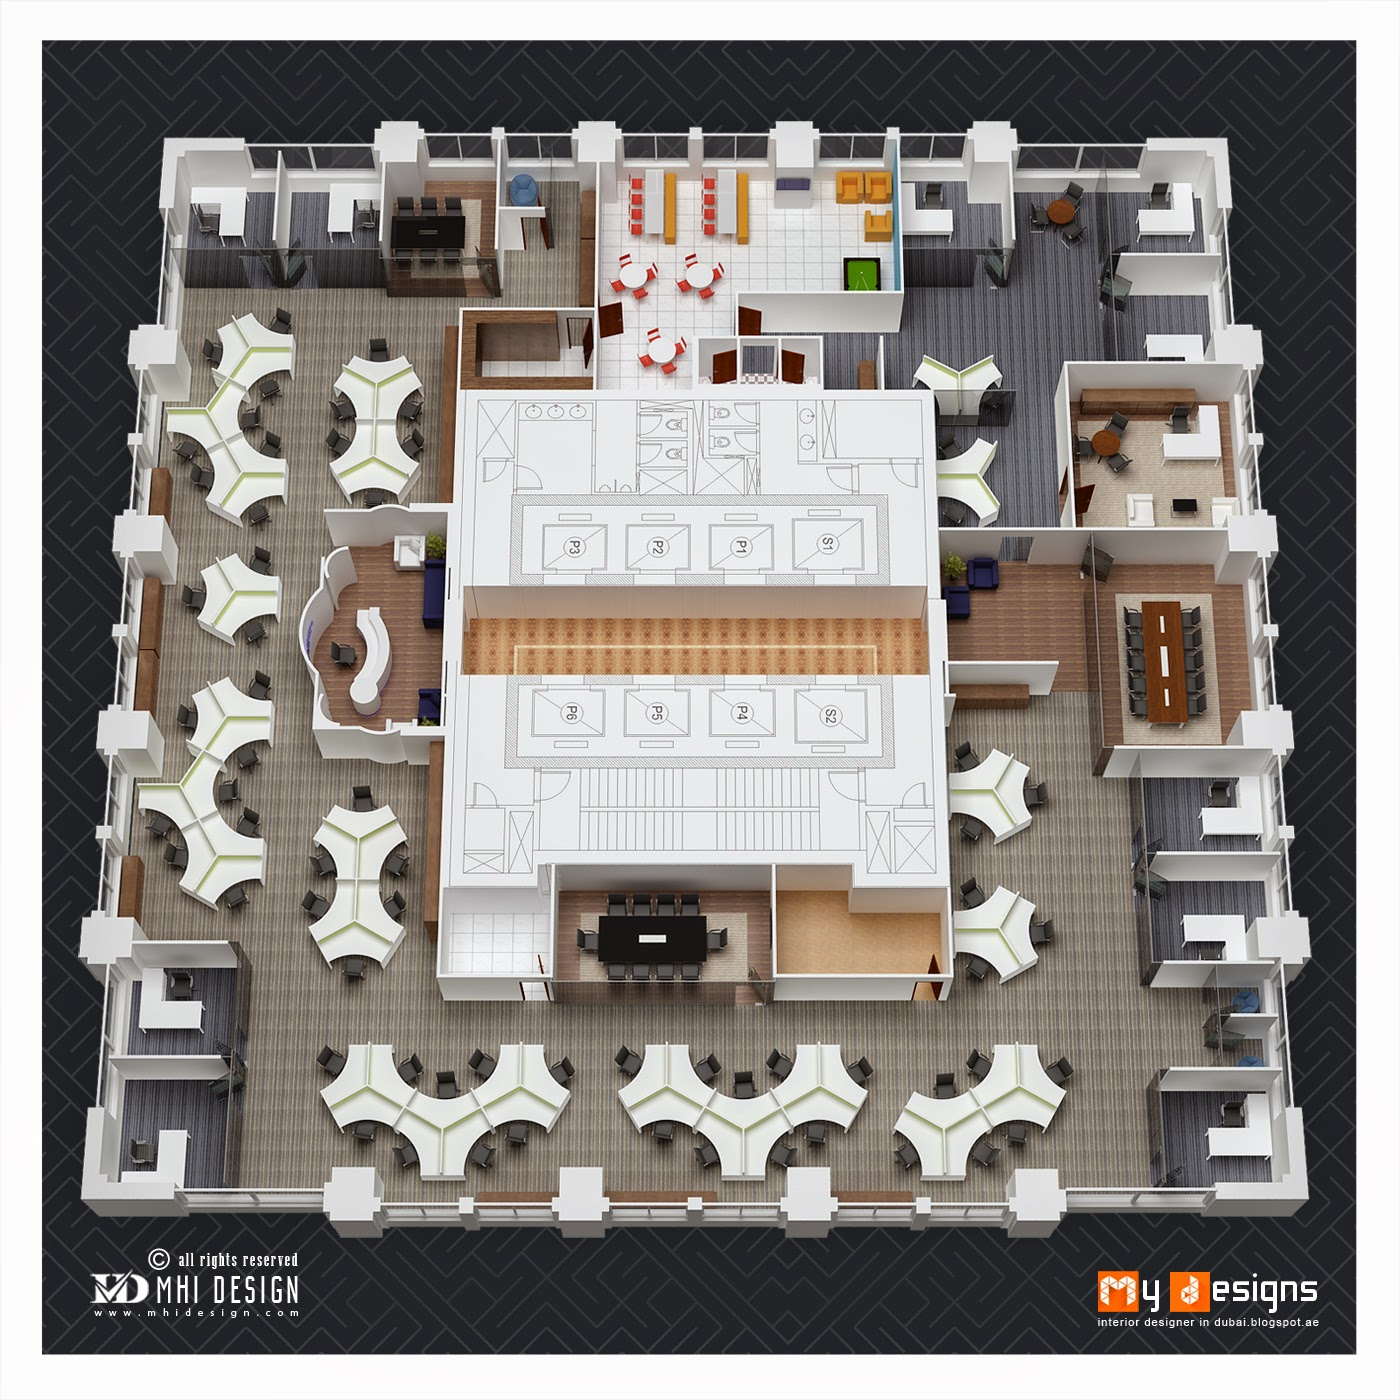 Top Interior Design Firm In Dubai: Office Interior Designs In Dubai